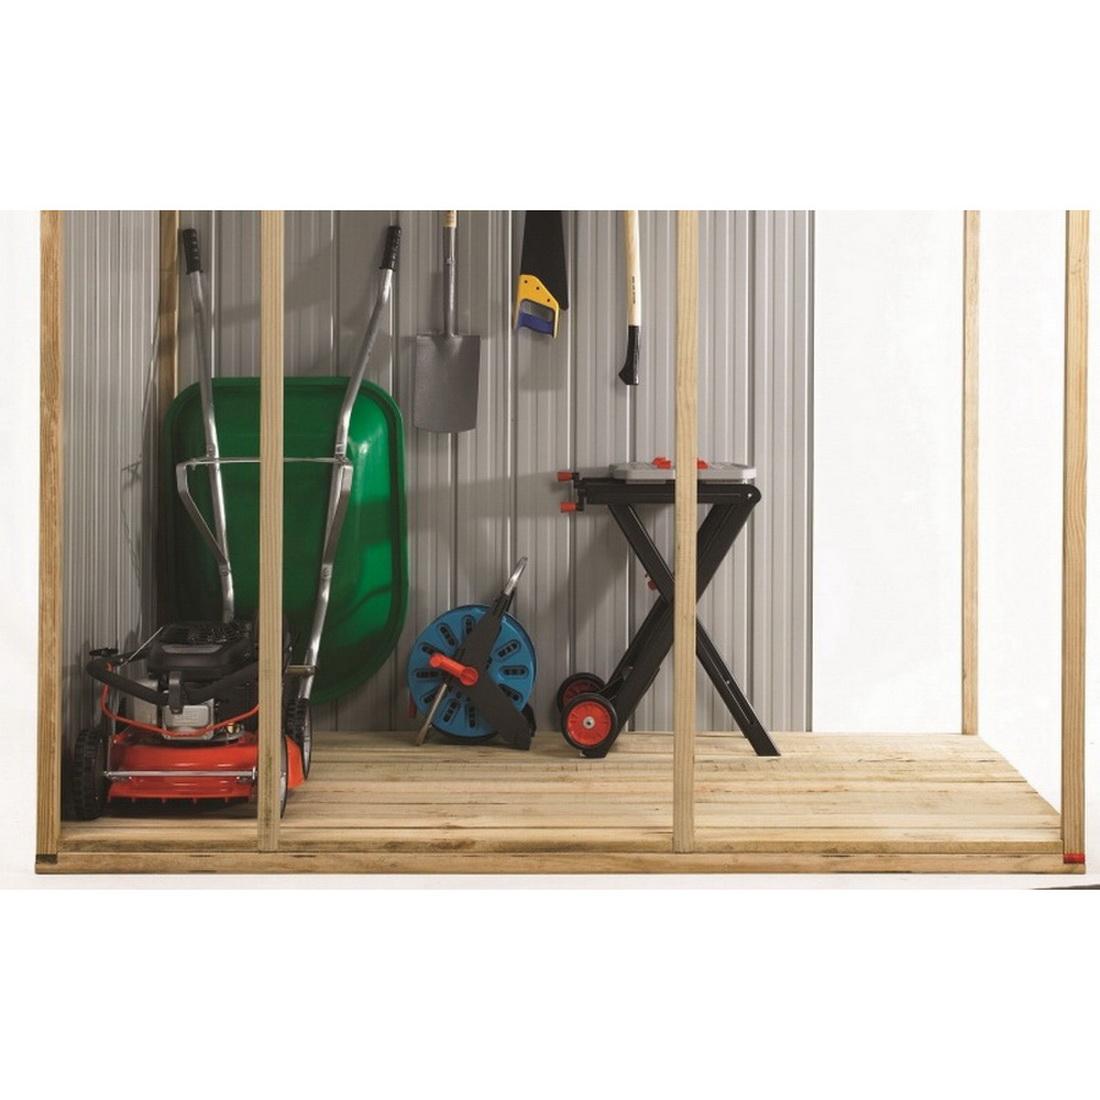 Kiwi Garden Shed Locker Timber Floor 1.71 x 1.21m